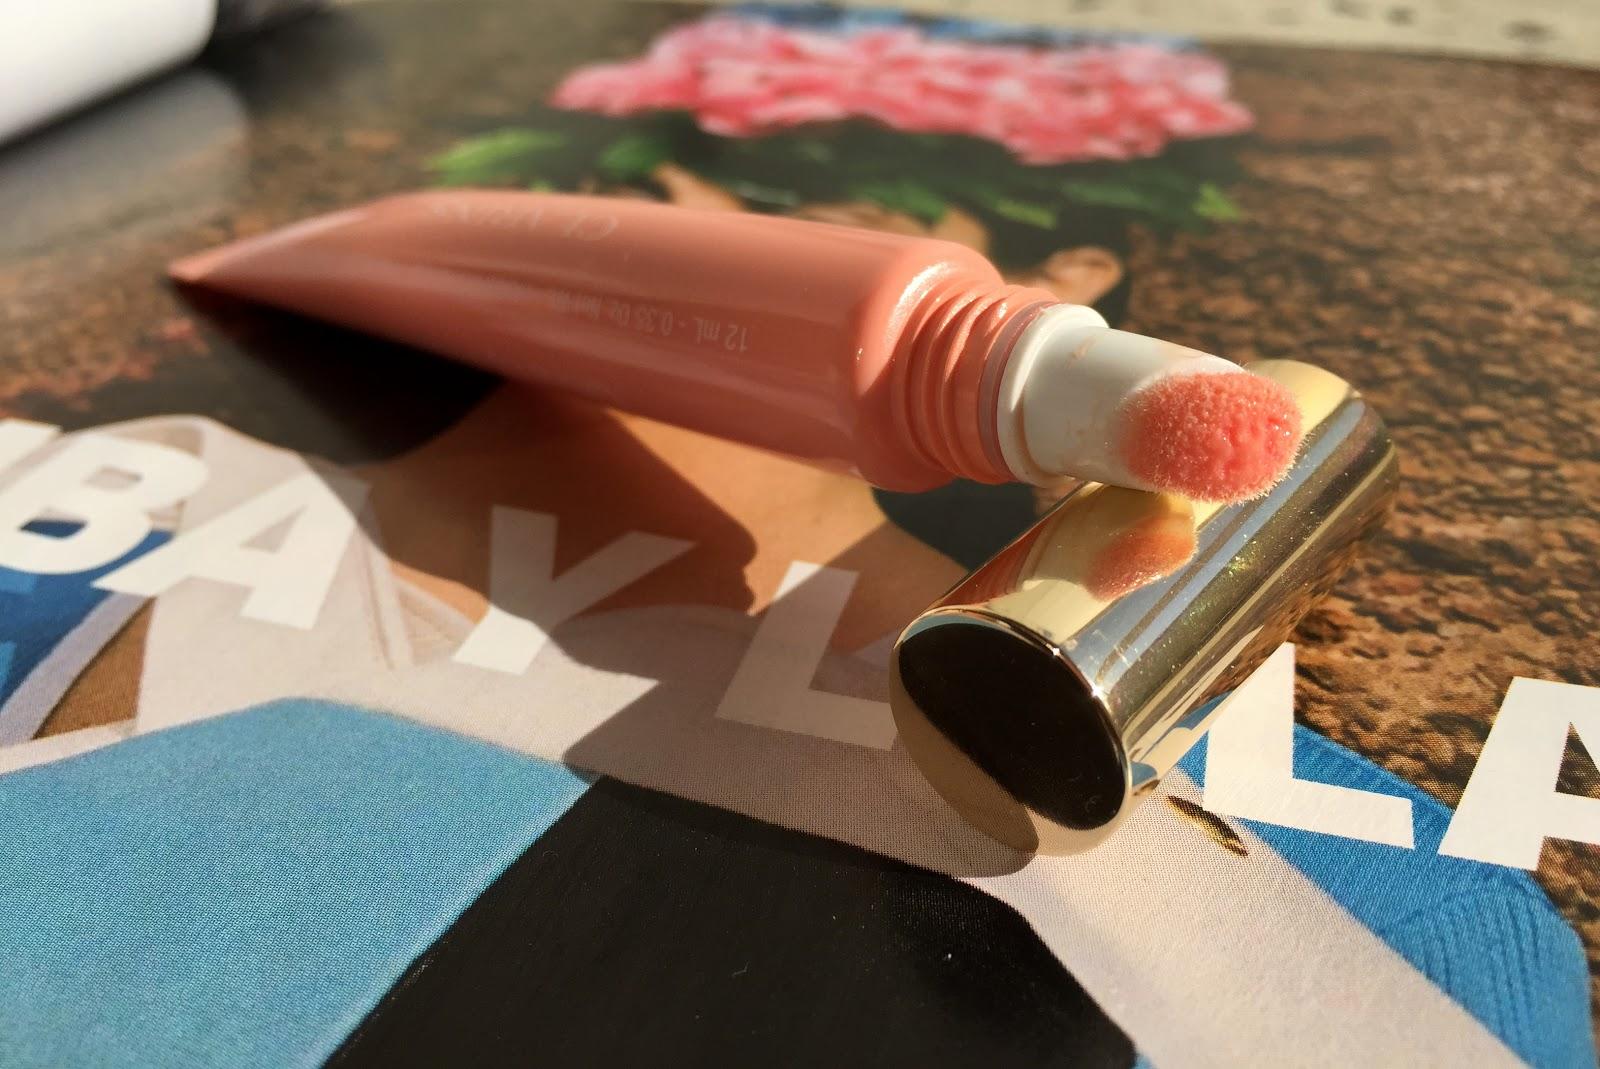 Clarins Instant Light Lip Perfector, Clarins instant light lip perfector, Clarins lipstick, Calrins instant light lip, Clarins lip gloss, Clarins lip balm, Clarins instant light apricot shimmer, apricot shimmer, apricot shimmer review